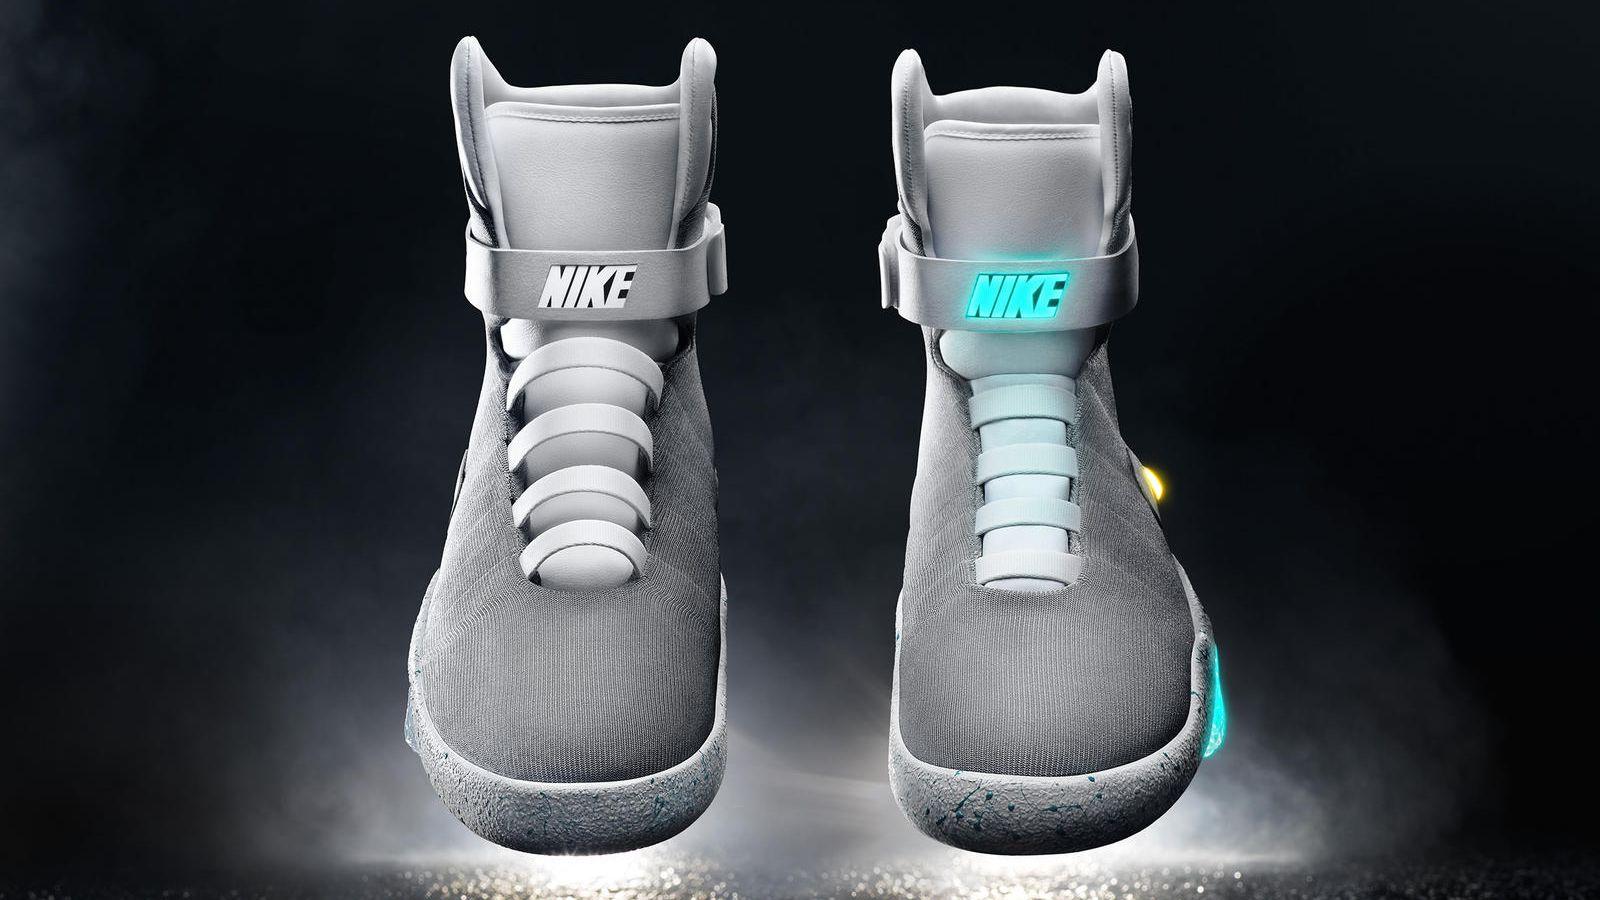 Nike Mags 2017 Prezzo